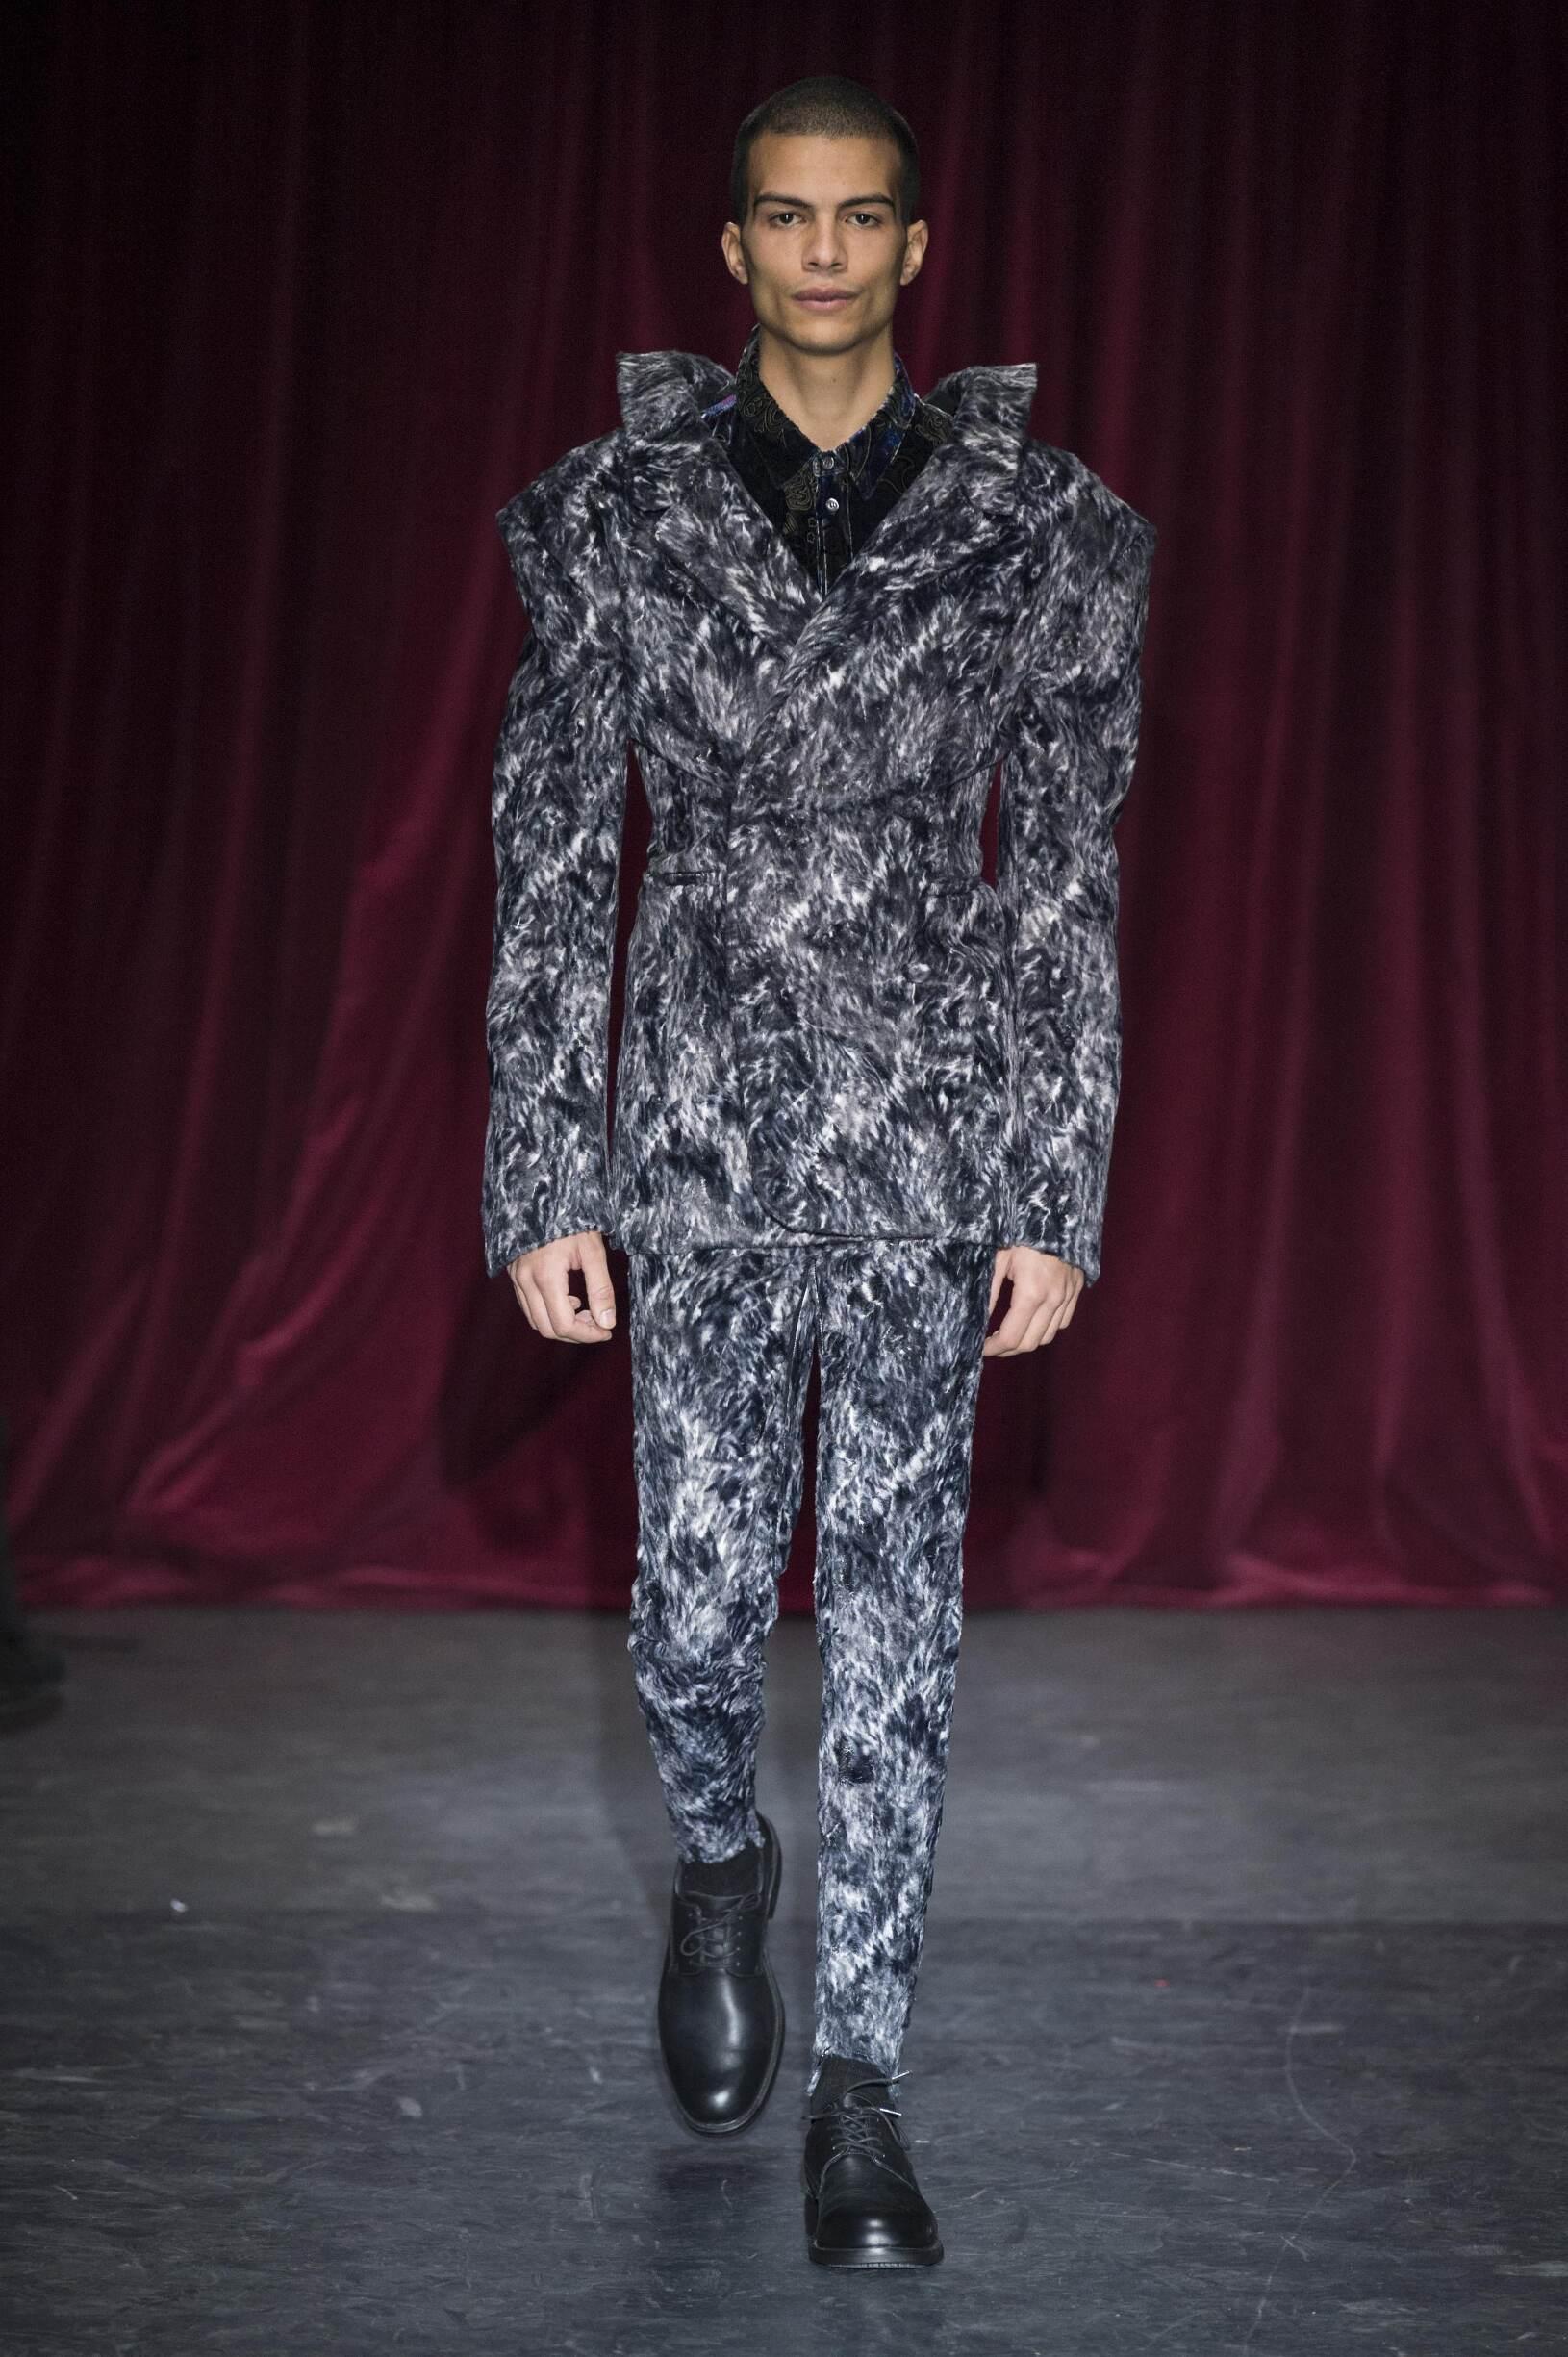 Catwalk Y/Project Man Fashion Show Winter 2017